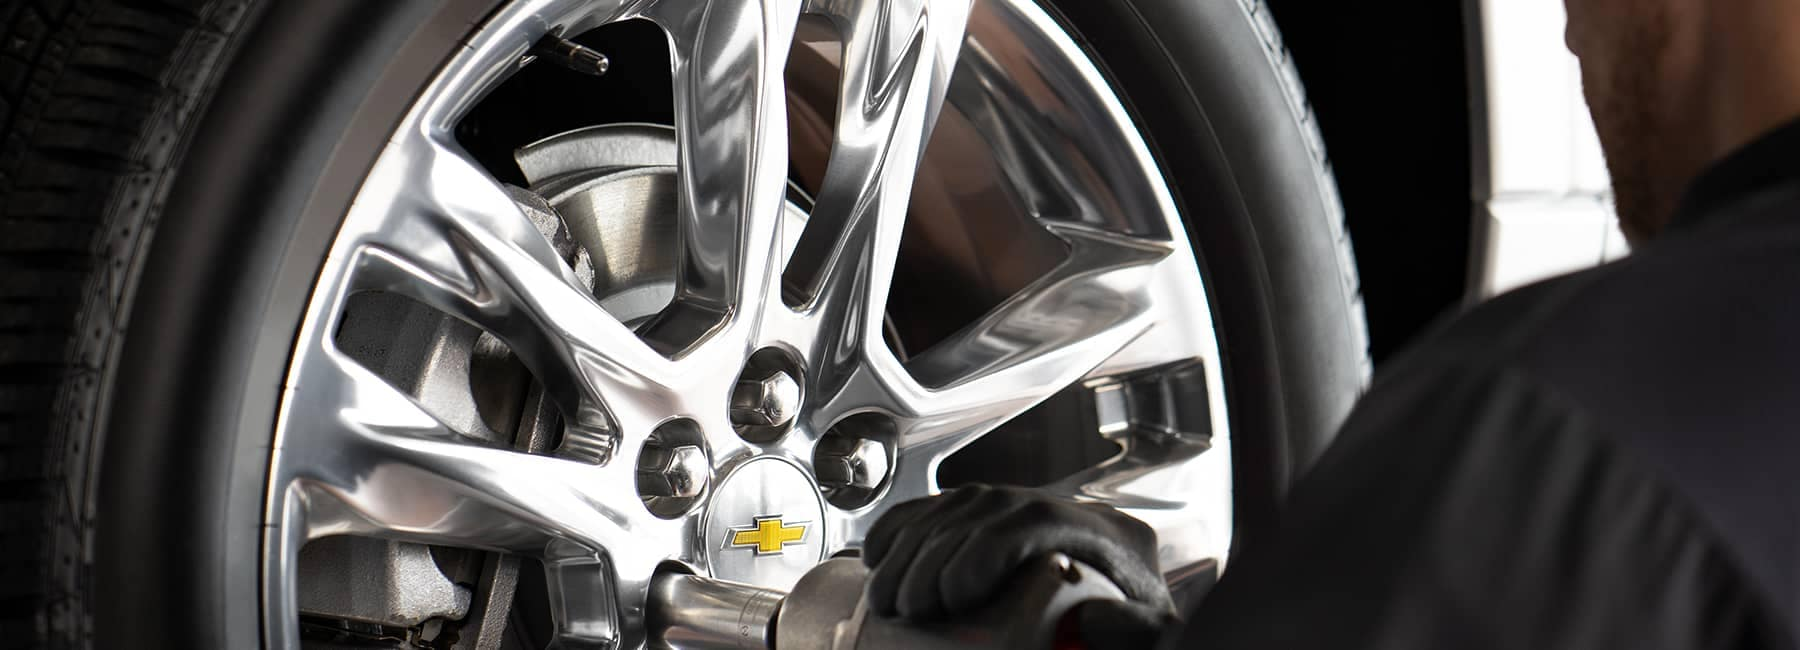 Chevrolet Service Tire Change